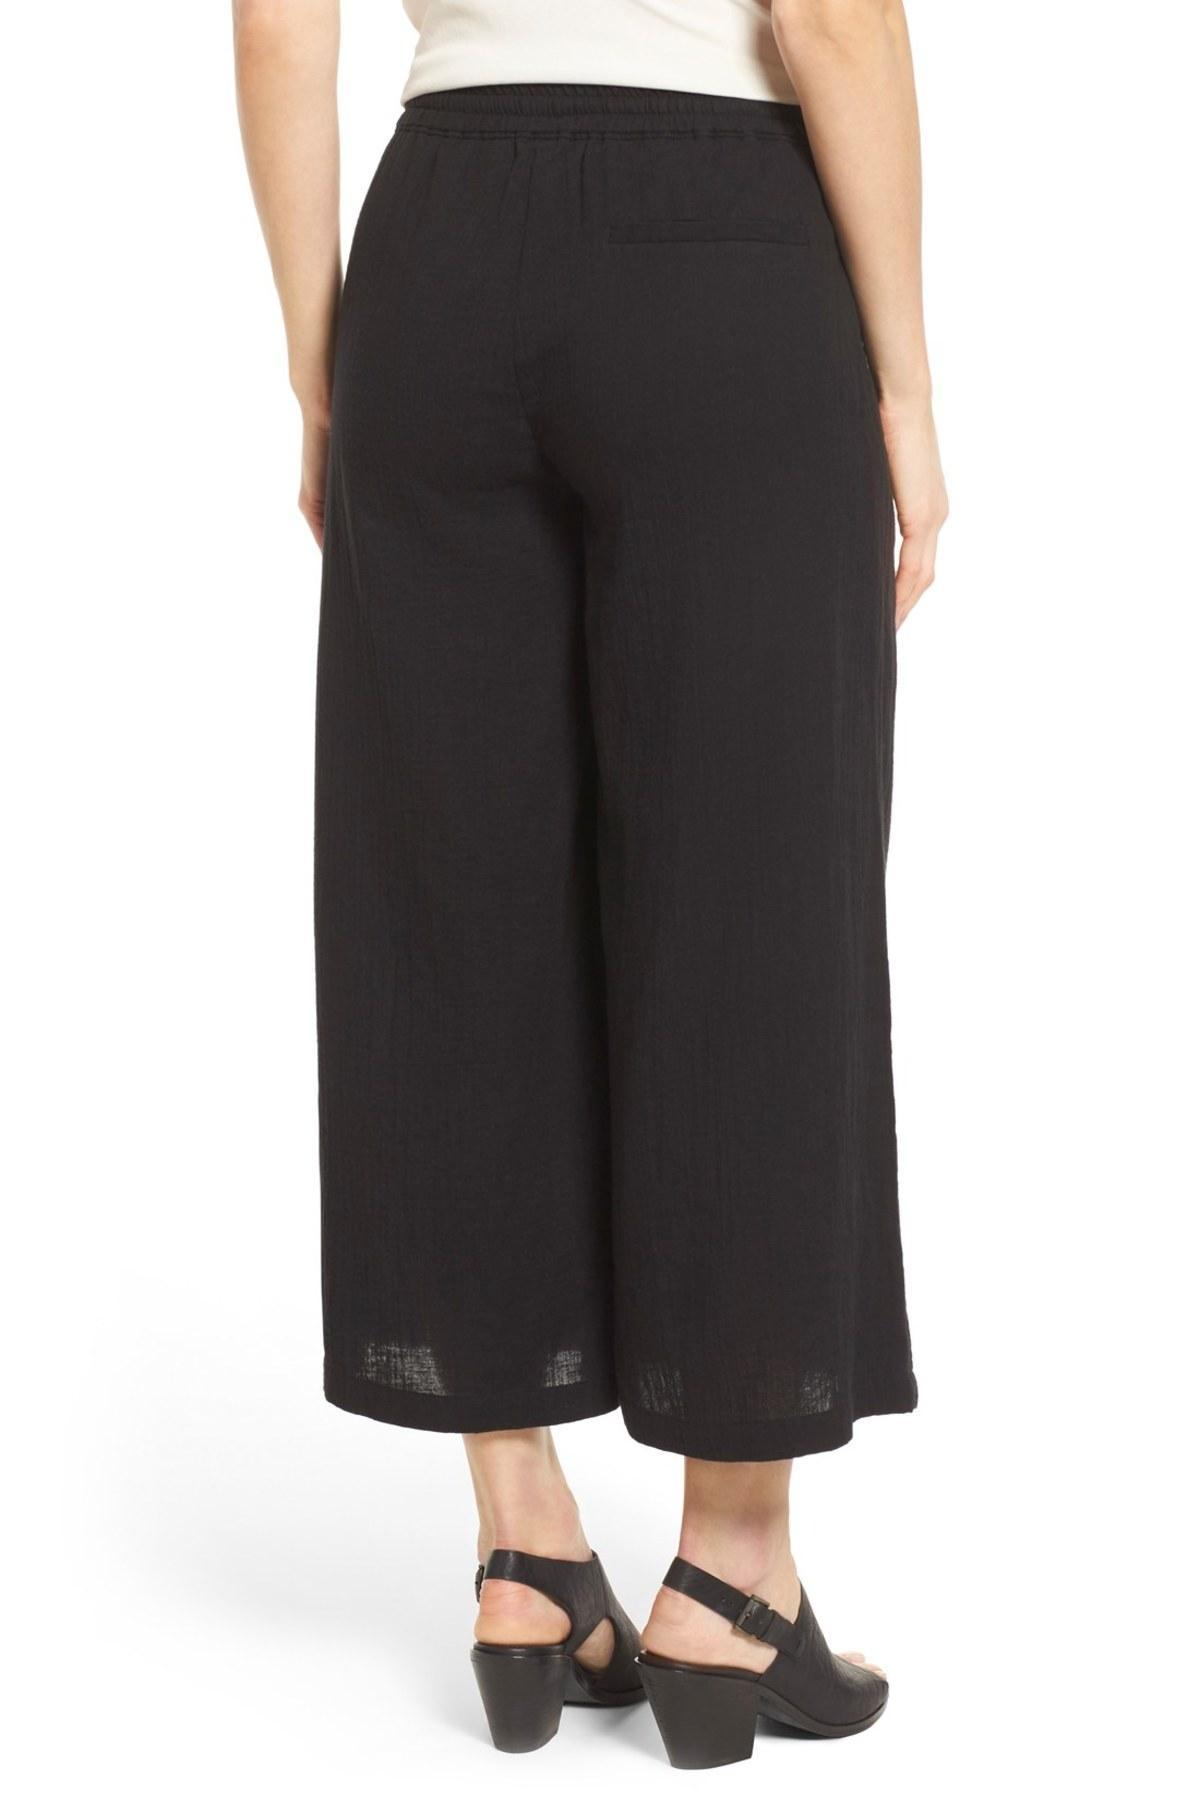 Eileen Fisher Organic Cotton Drawstring Waist Wide Leg